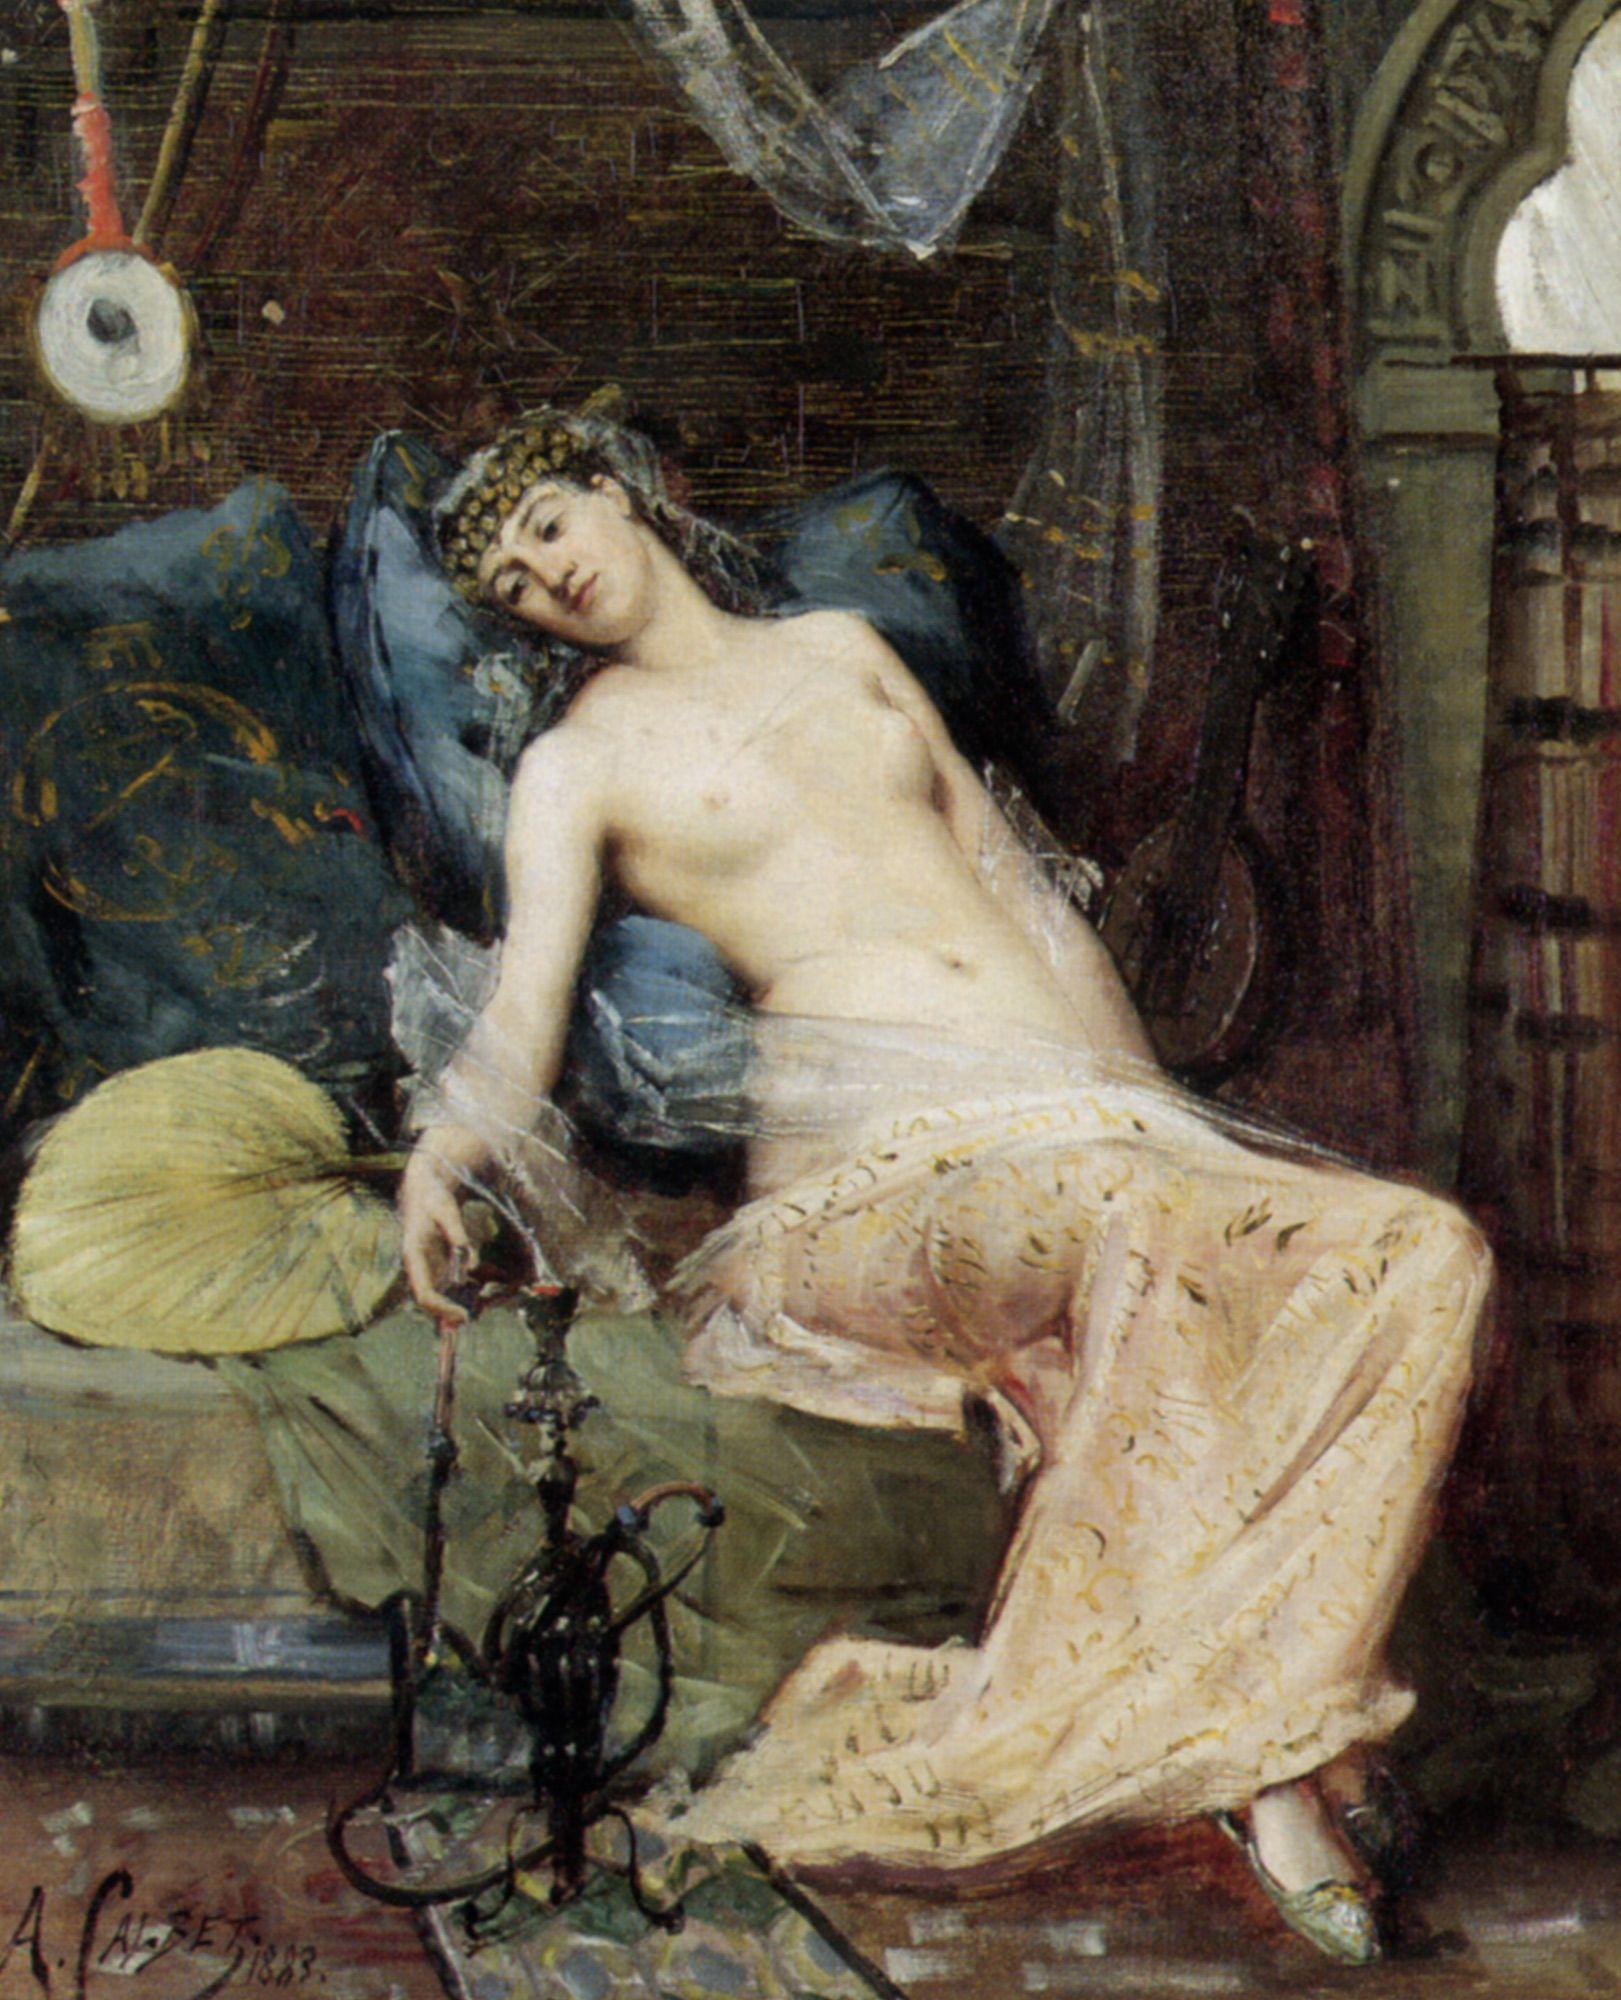 Erotic harem women